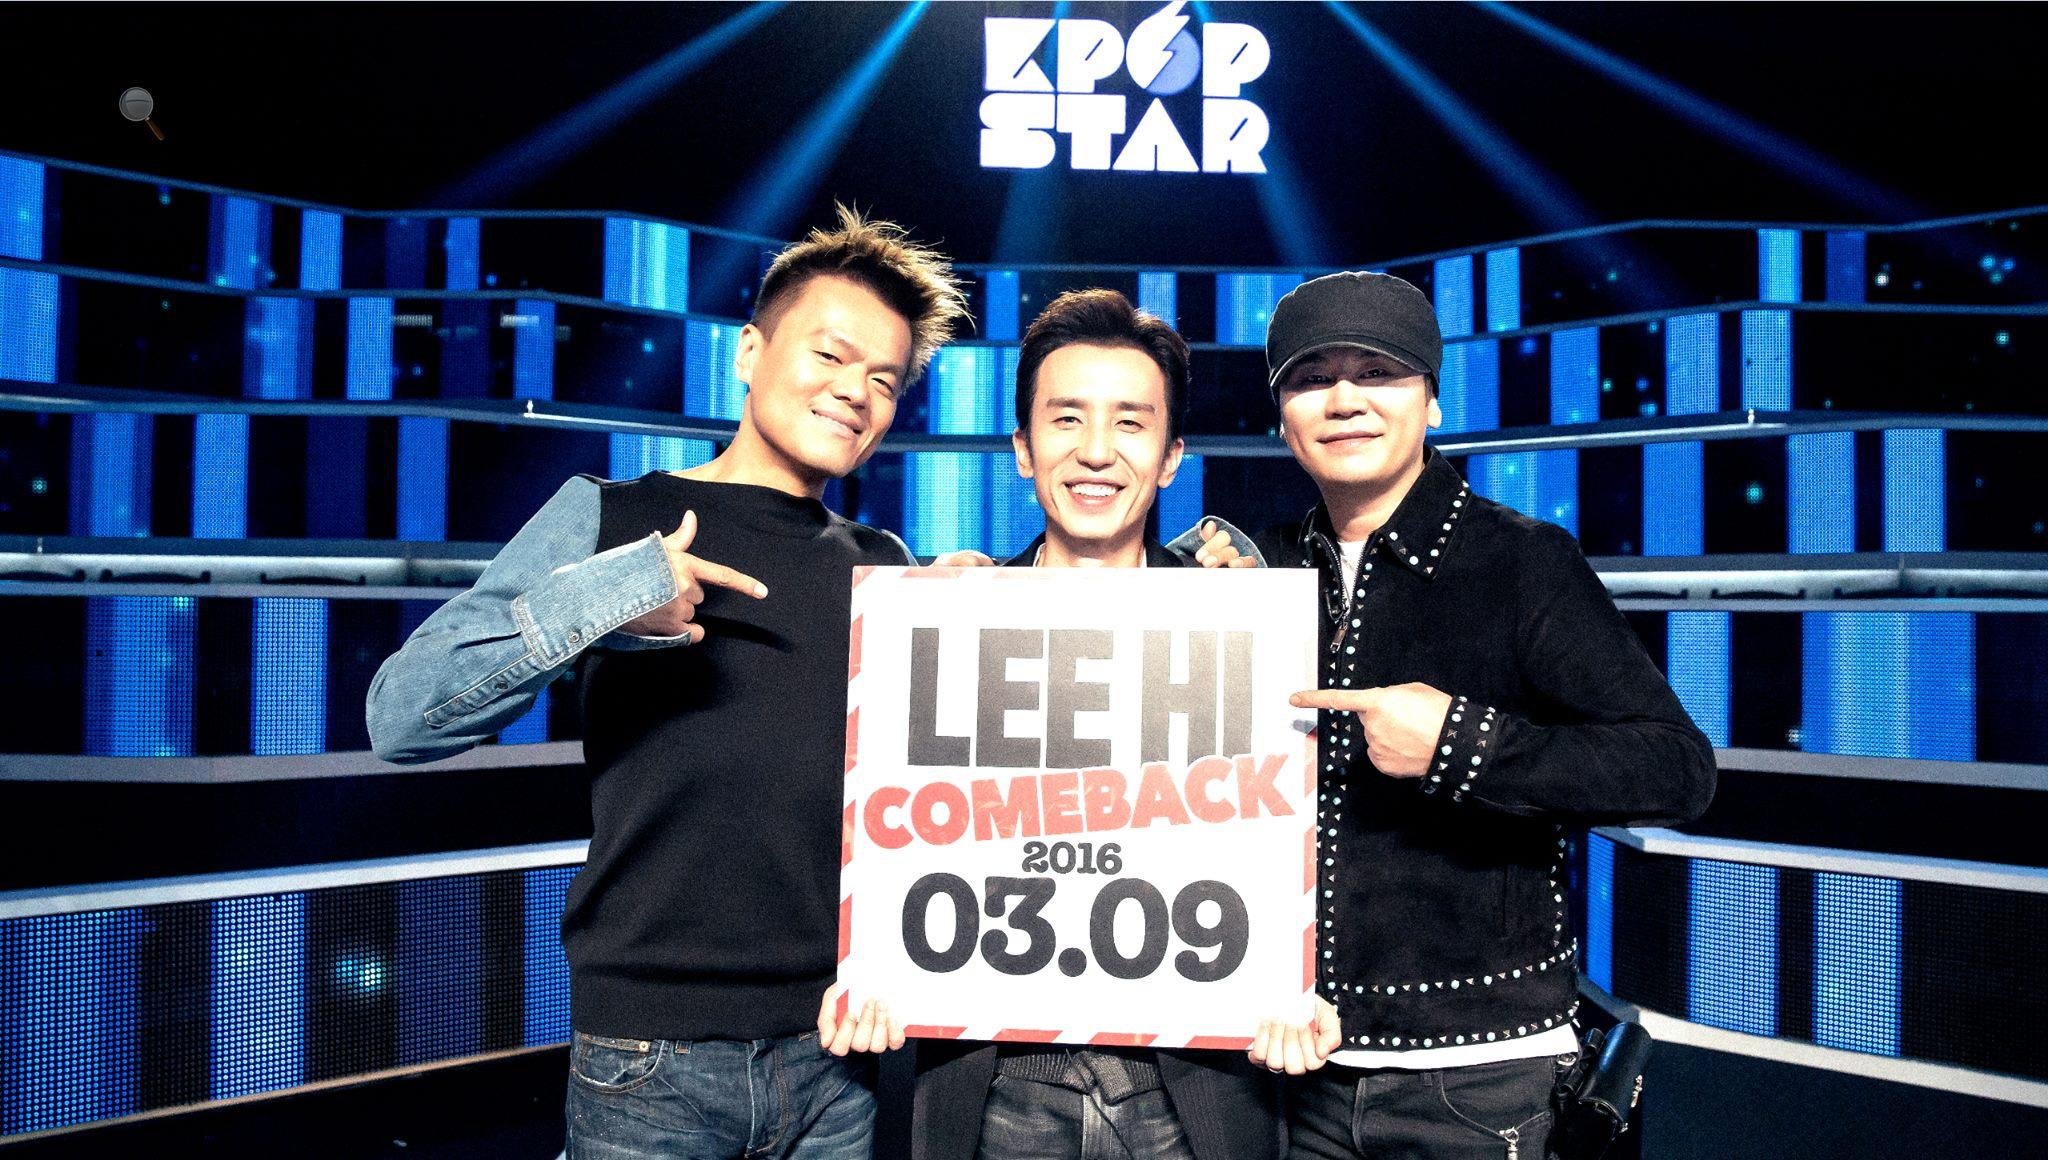 Lee Hi 2016 comeback